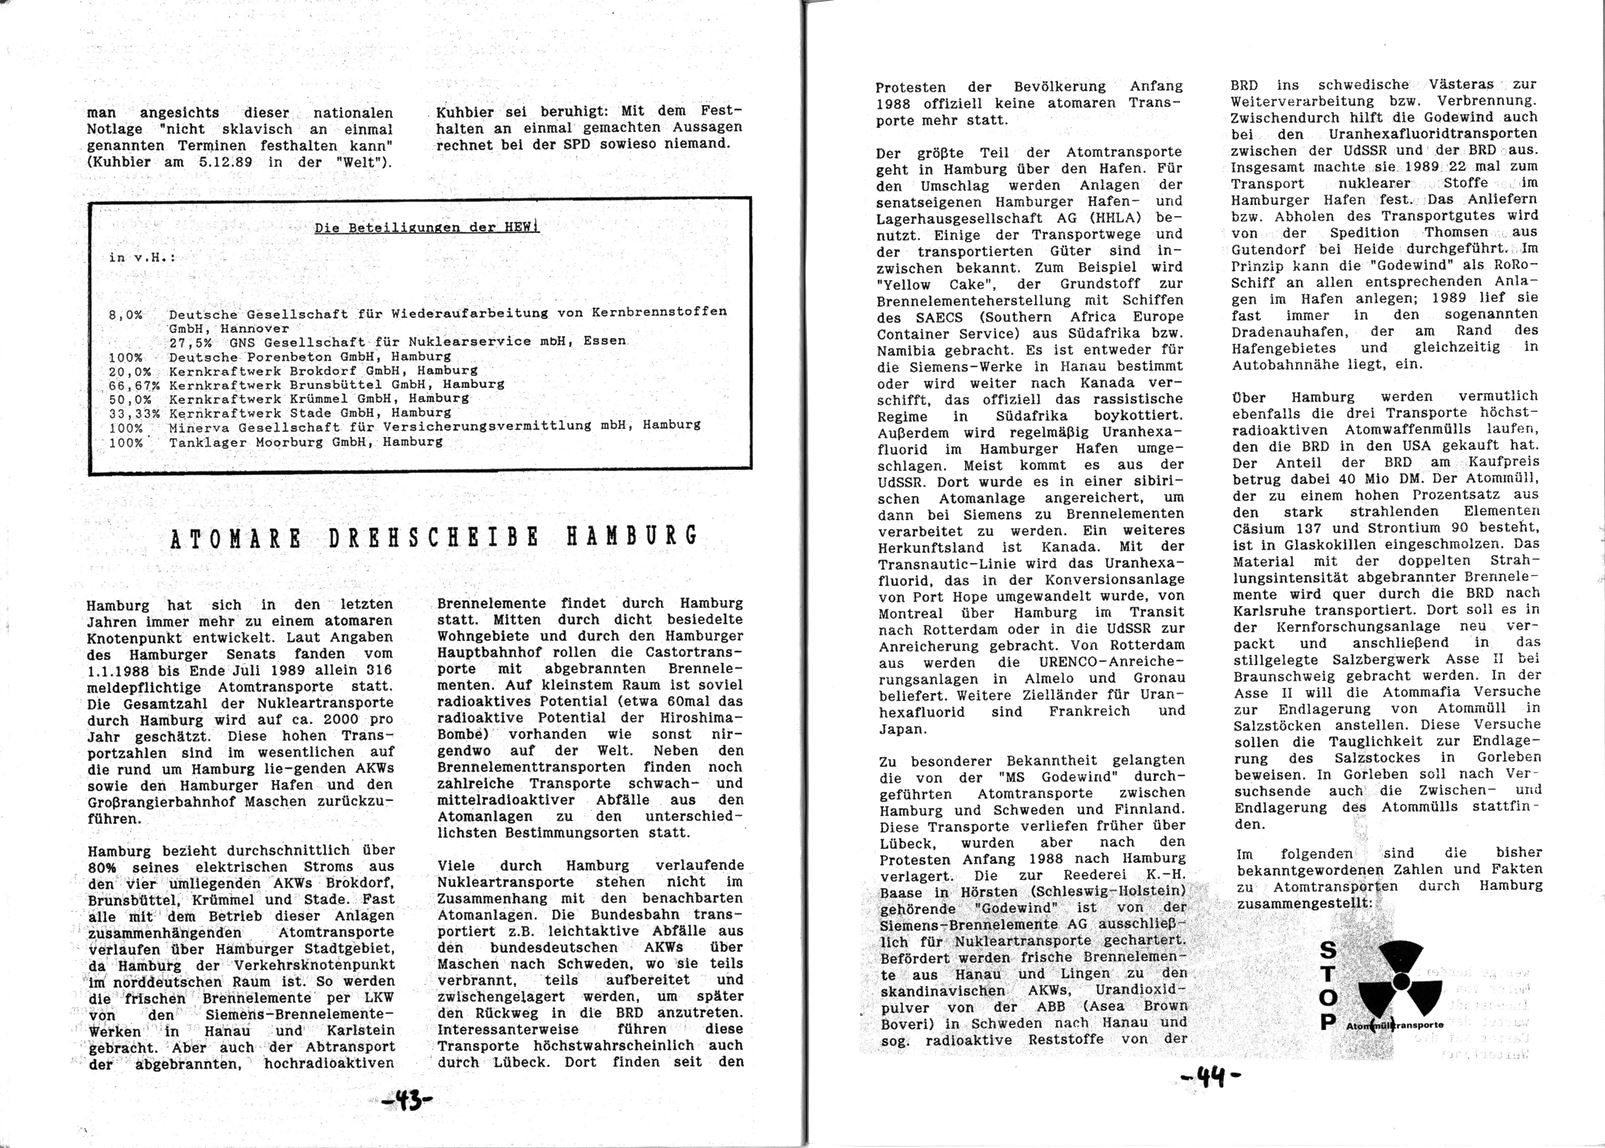 Hamburg_Atomtransporte_19900200_023